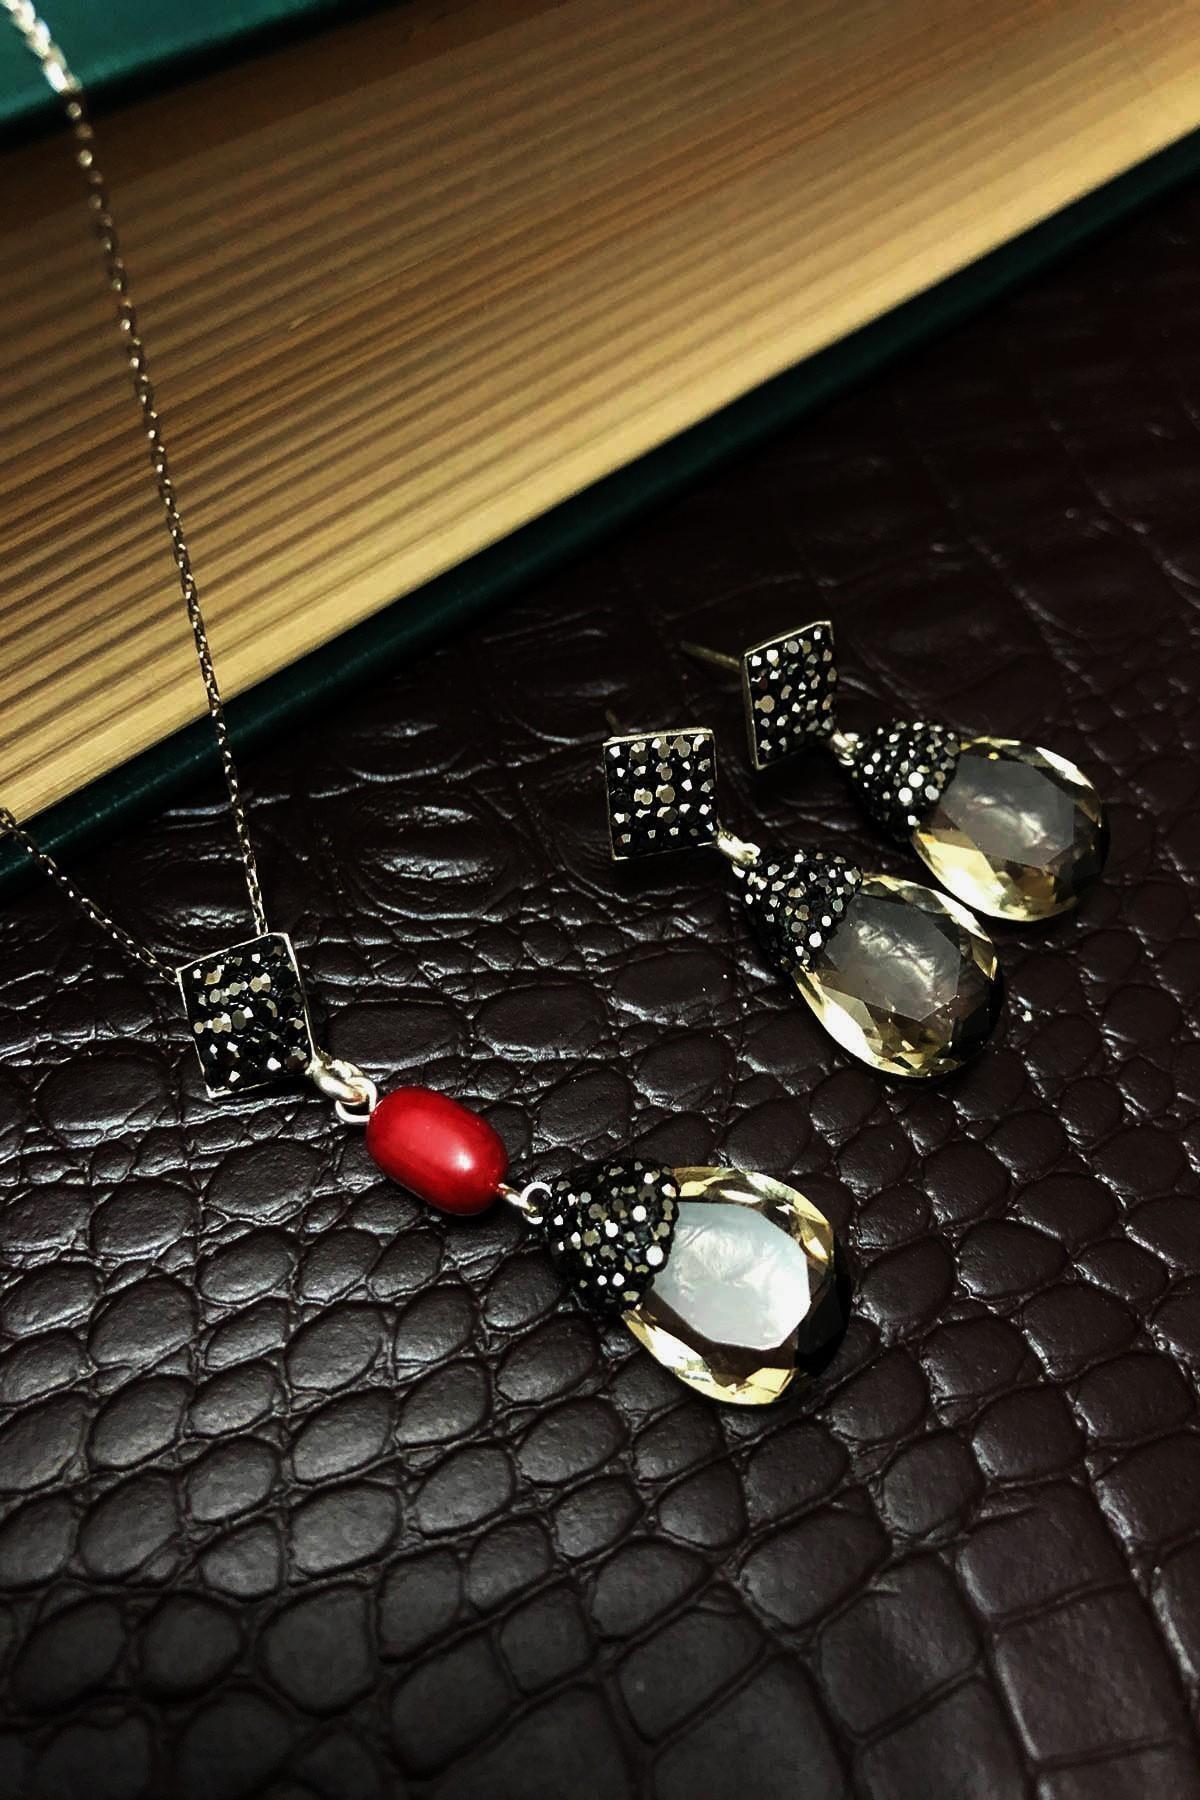 Dr. Stone Kadın Topaz Rengi Hindistan Kristali Ve Mercan Gümüş Set Xdrsott7 2